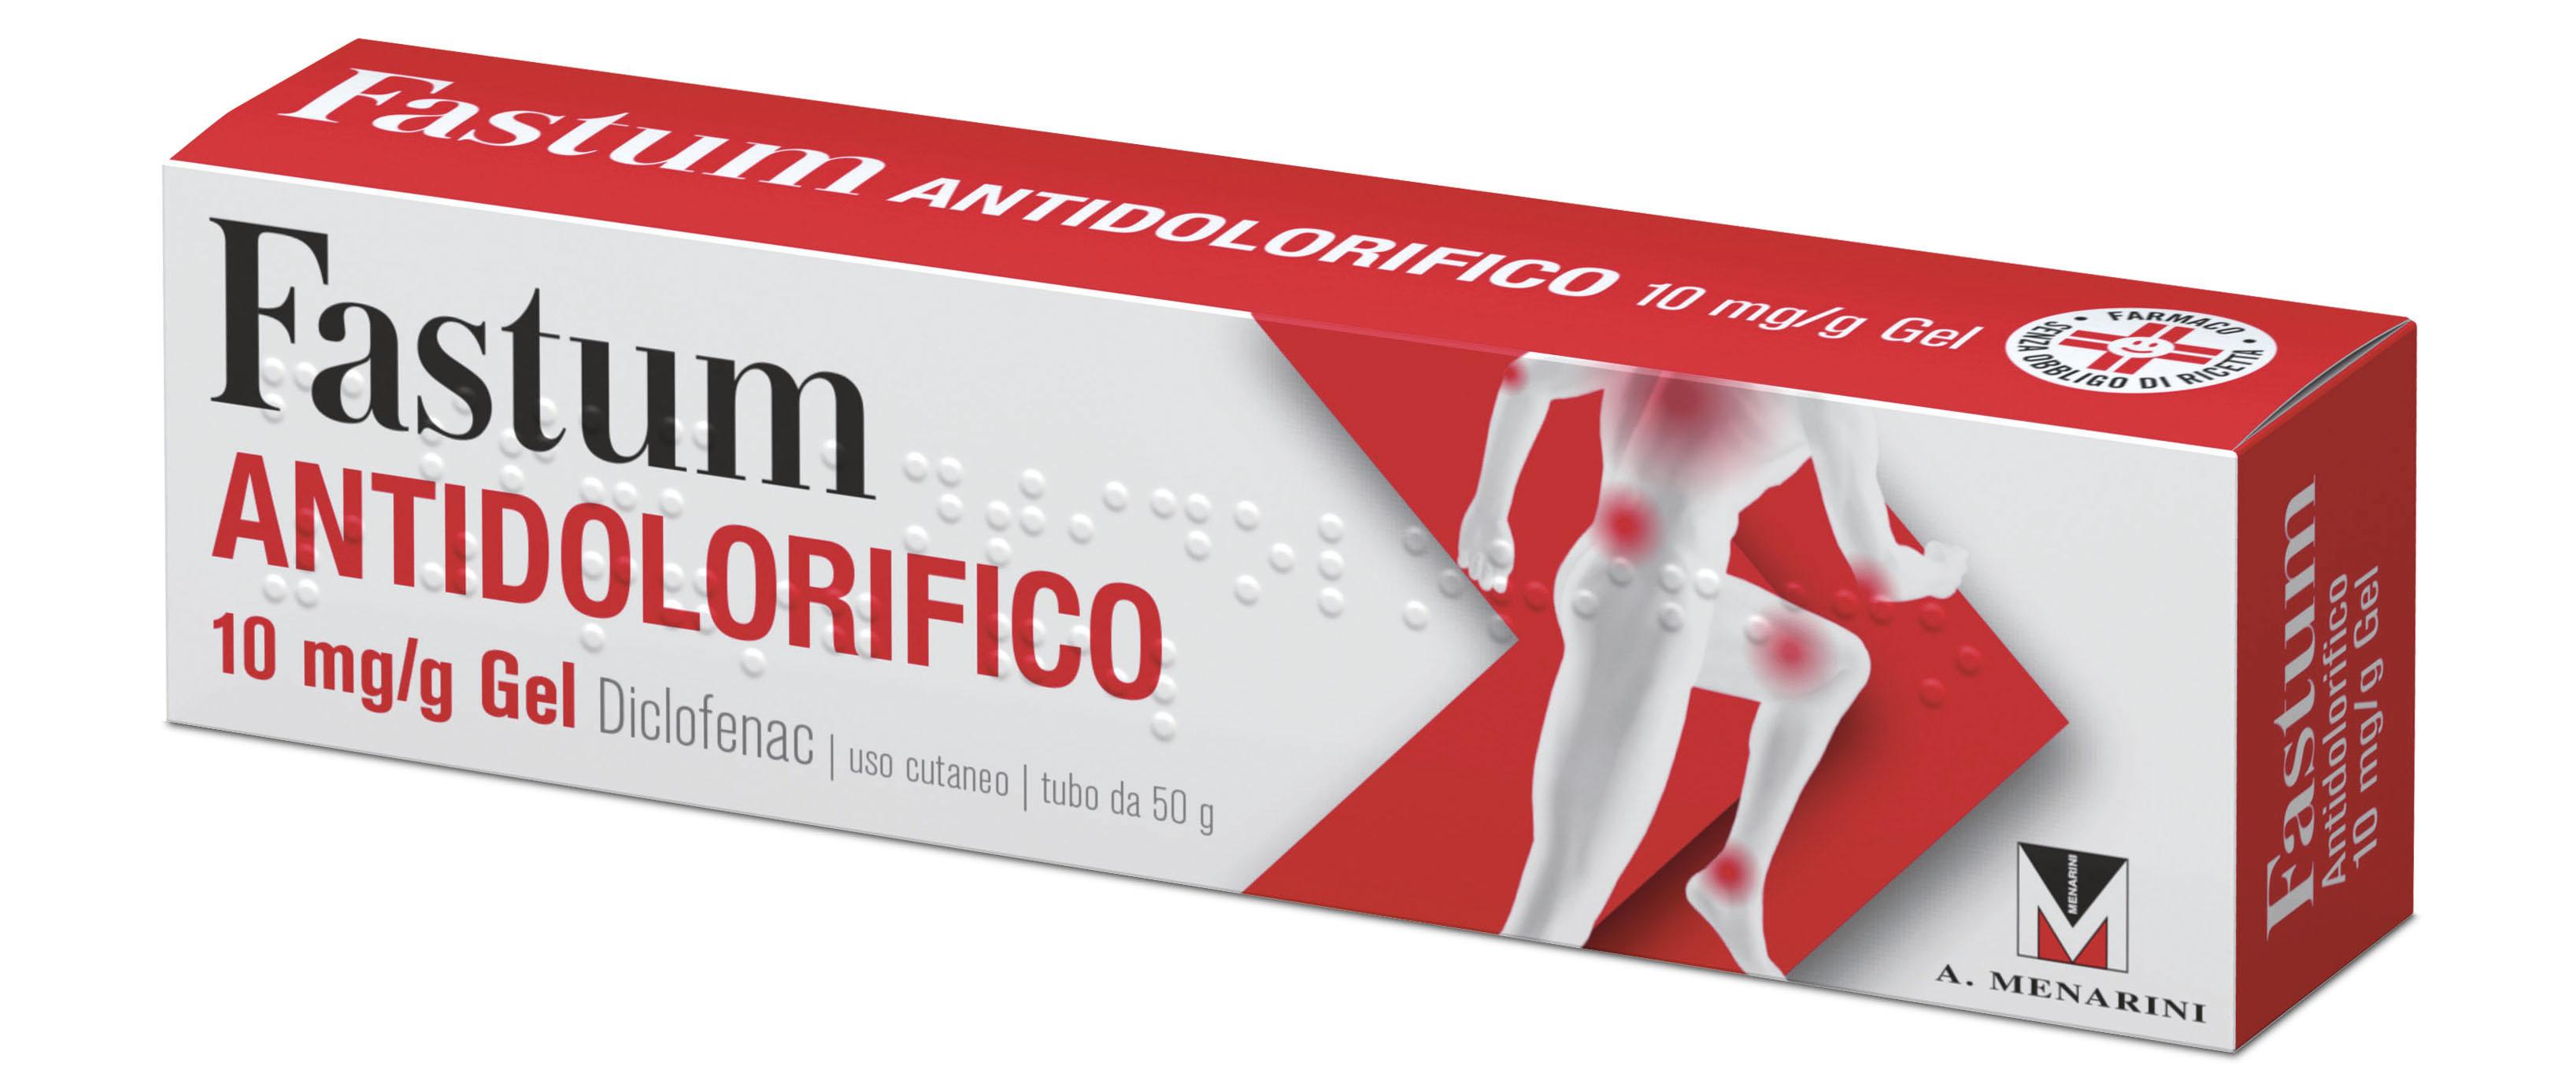 Fastum-Antidolorifico-50mg